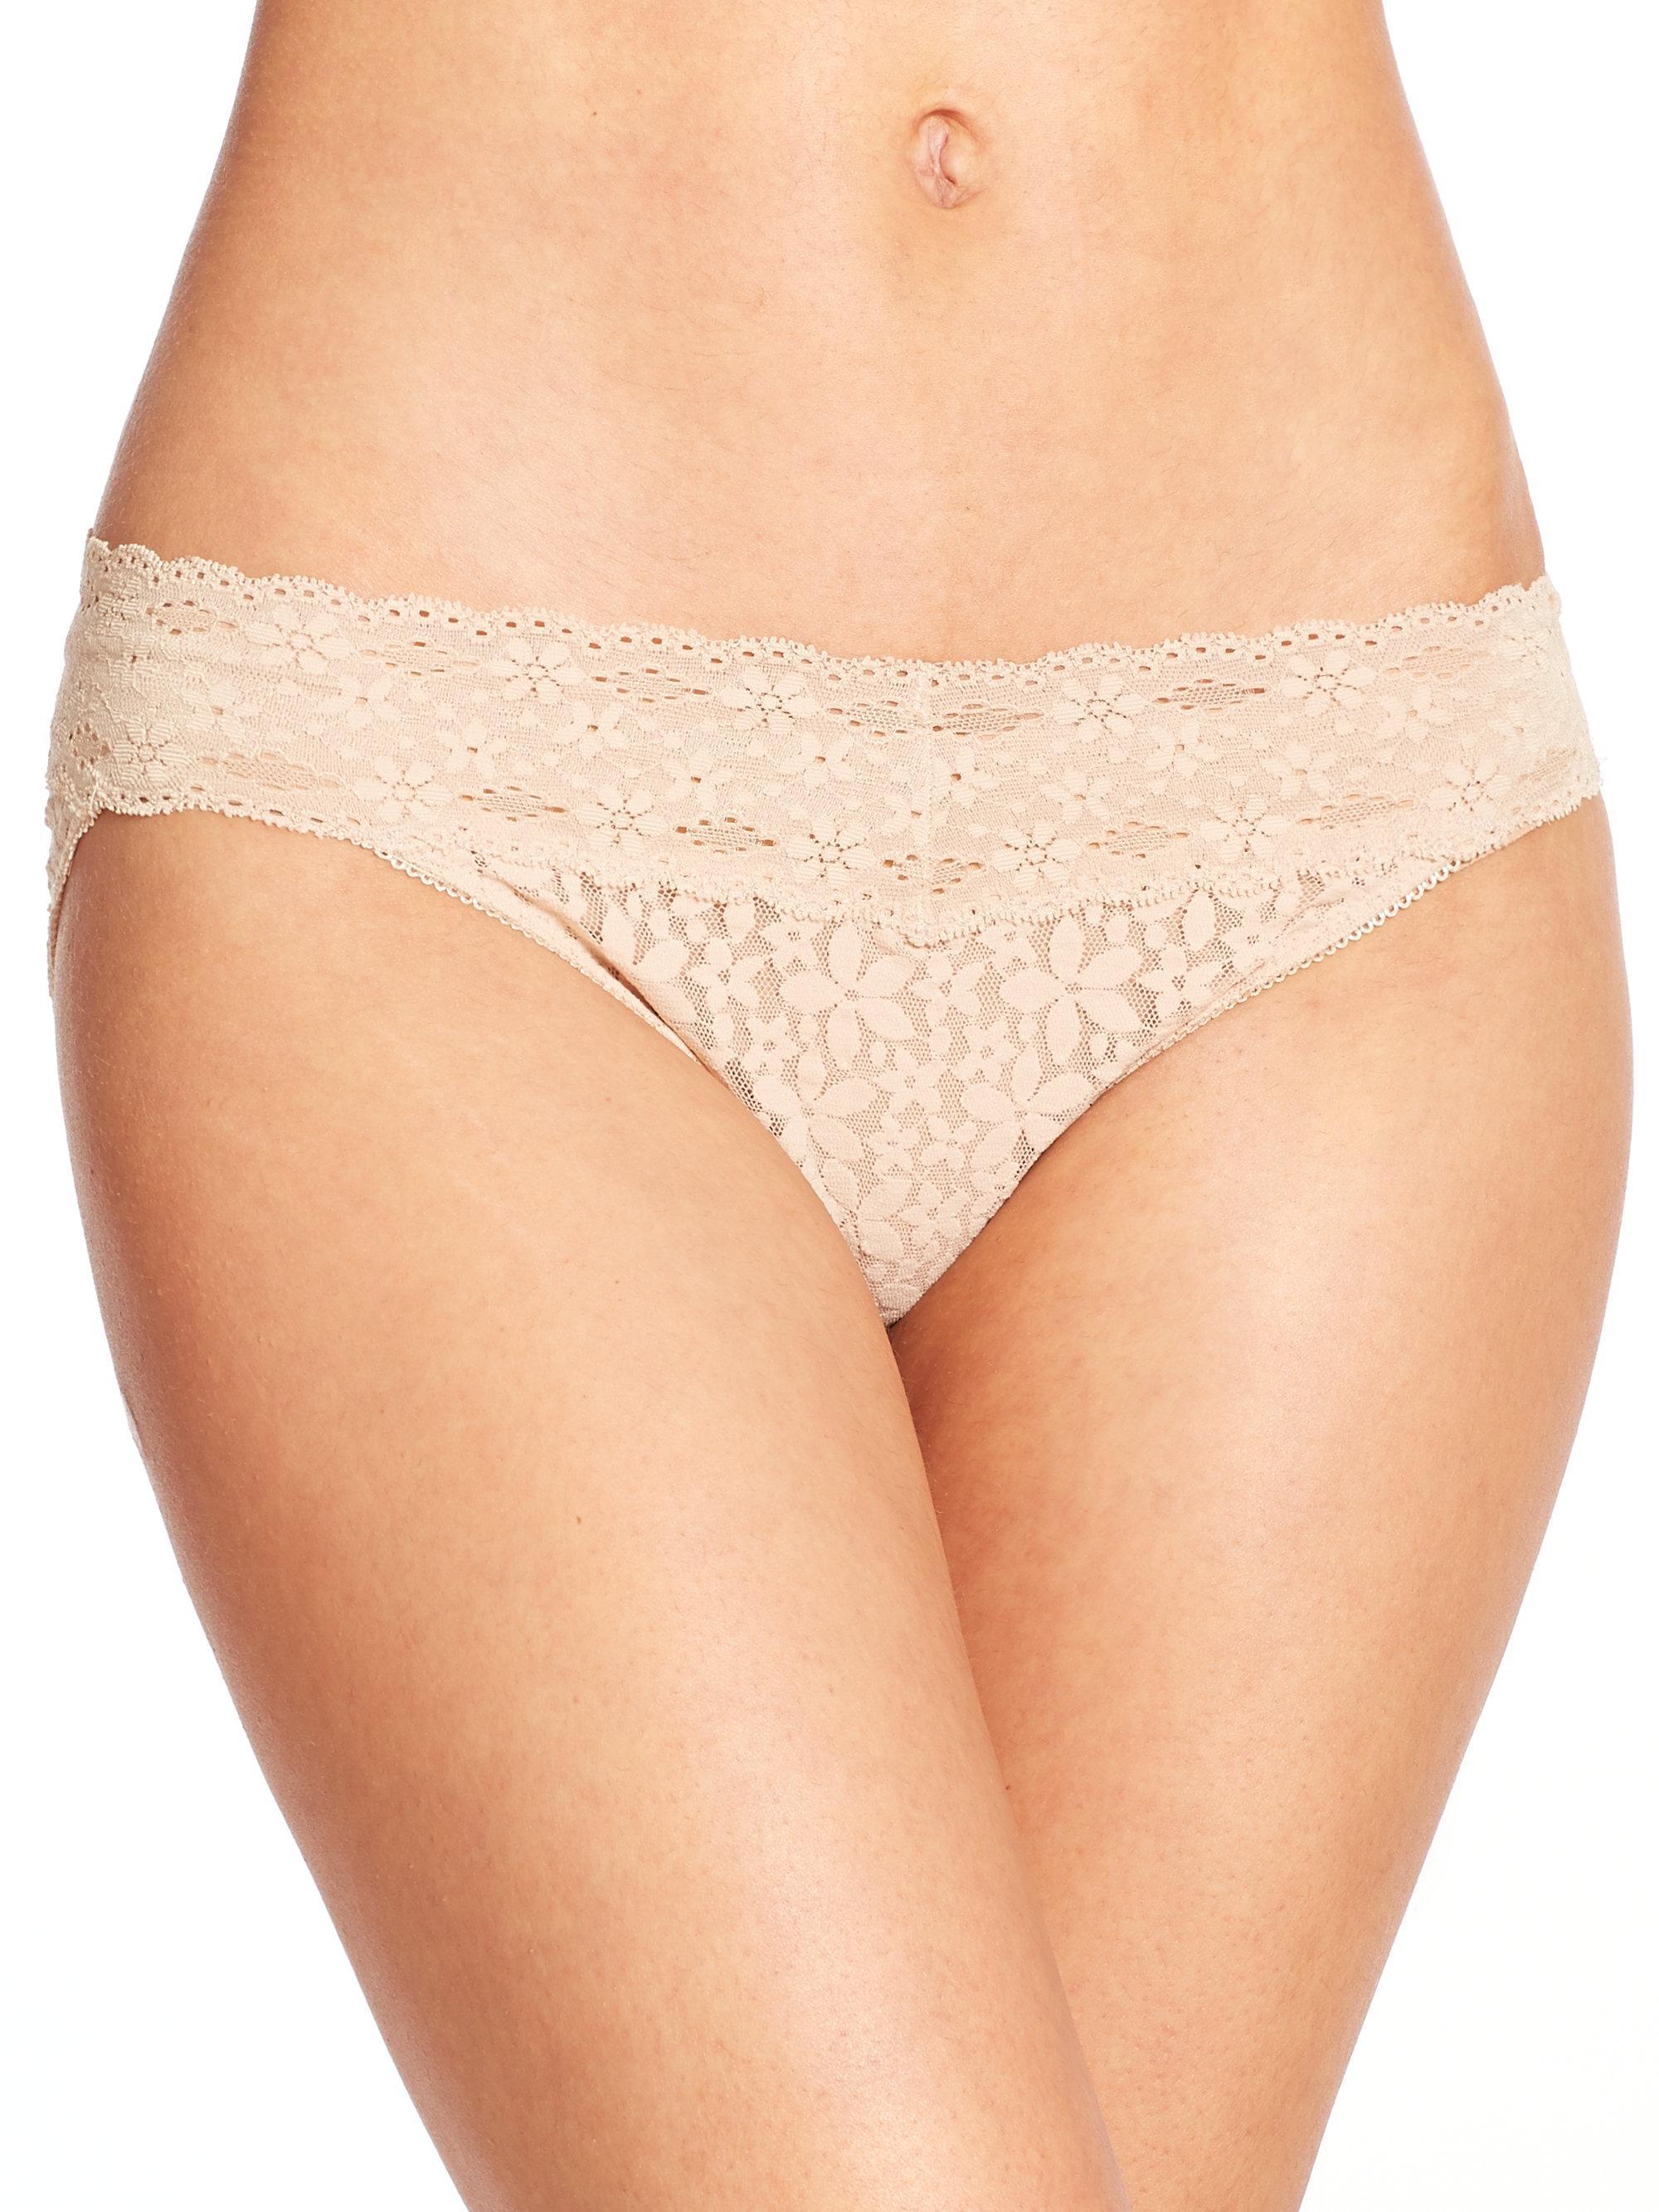 Halo lace bikini panty wacoal rather